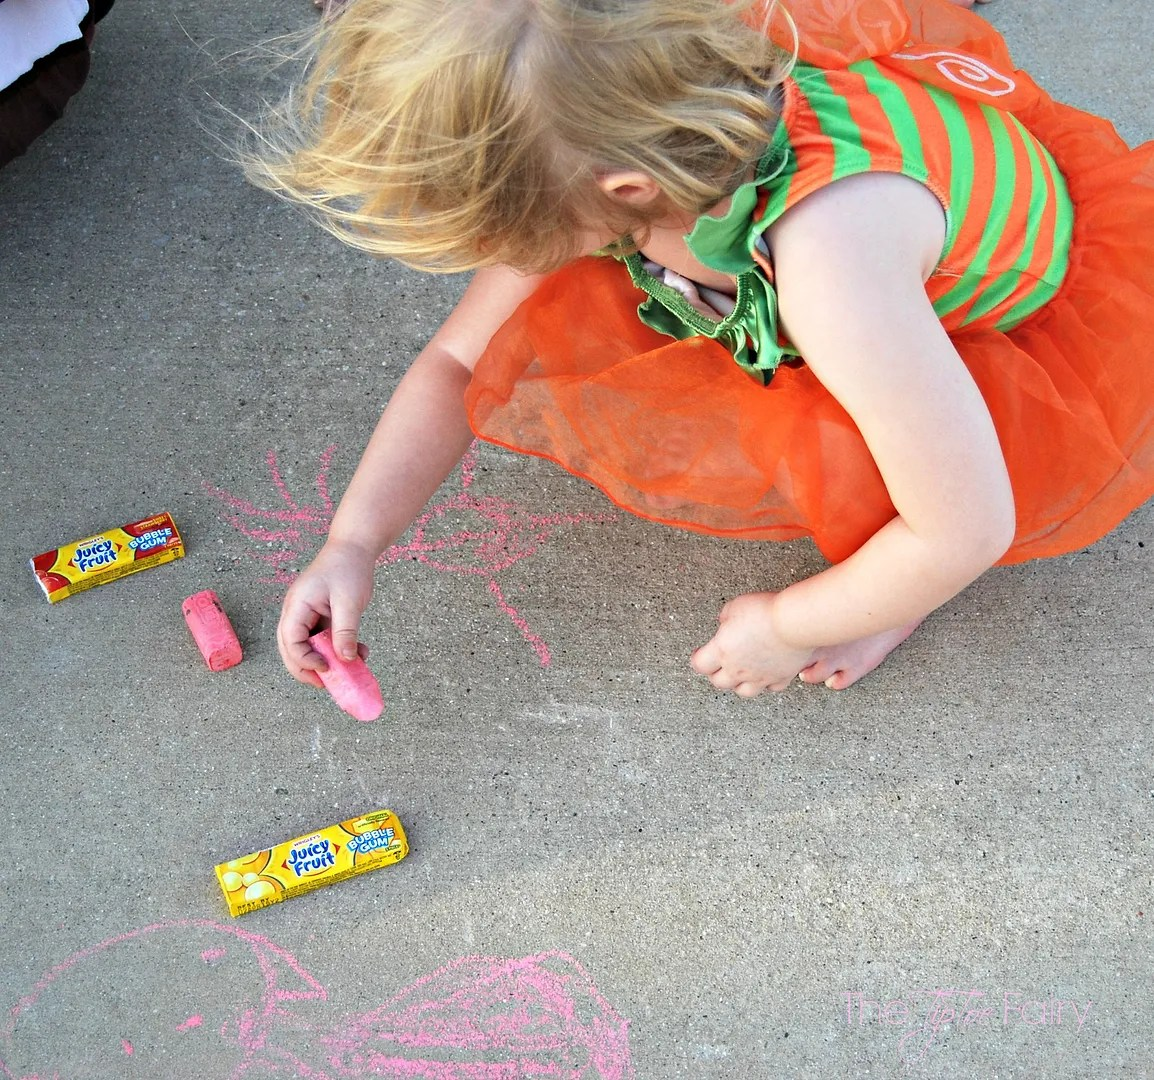 Bubble Blowing Contest | The TipToe Fairy #JuiceFruitFunSide #kidsactivities